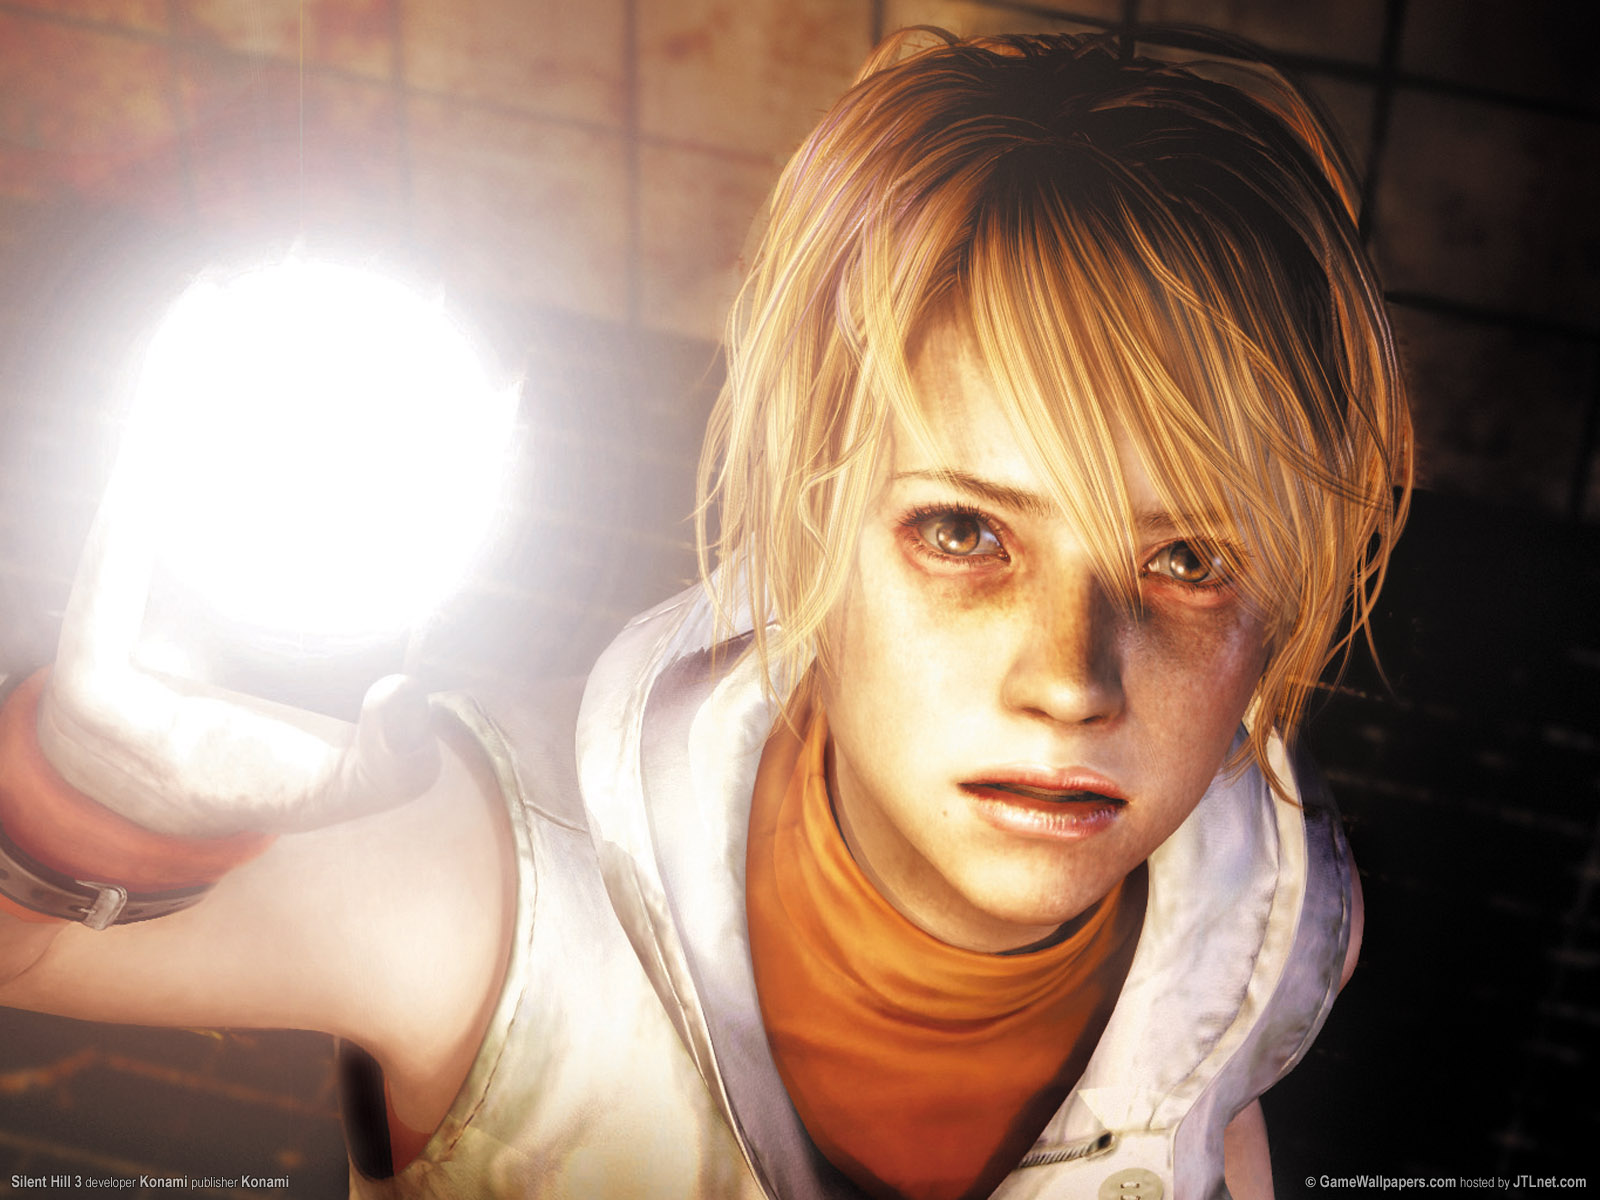 Silent Hill 3 : de pire en pire